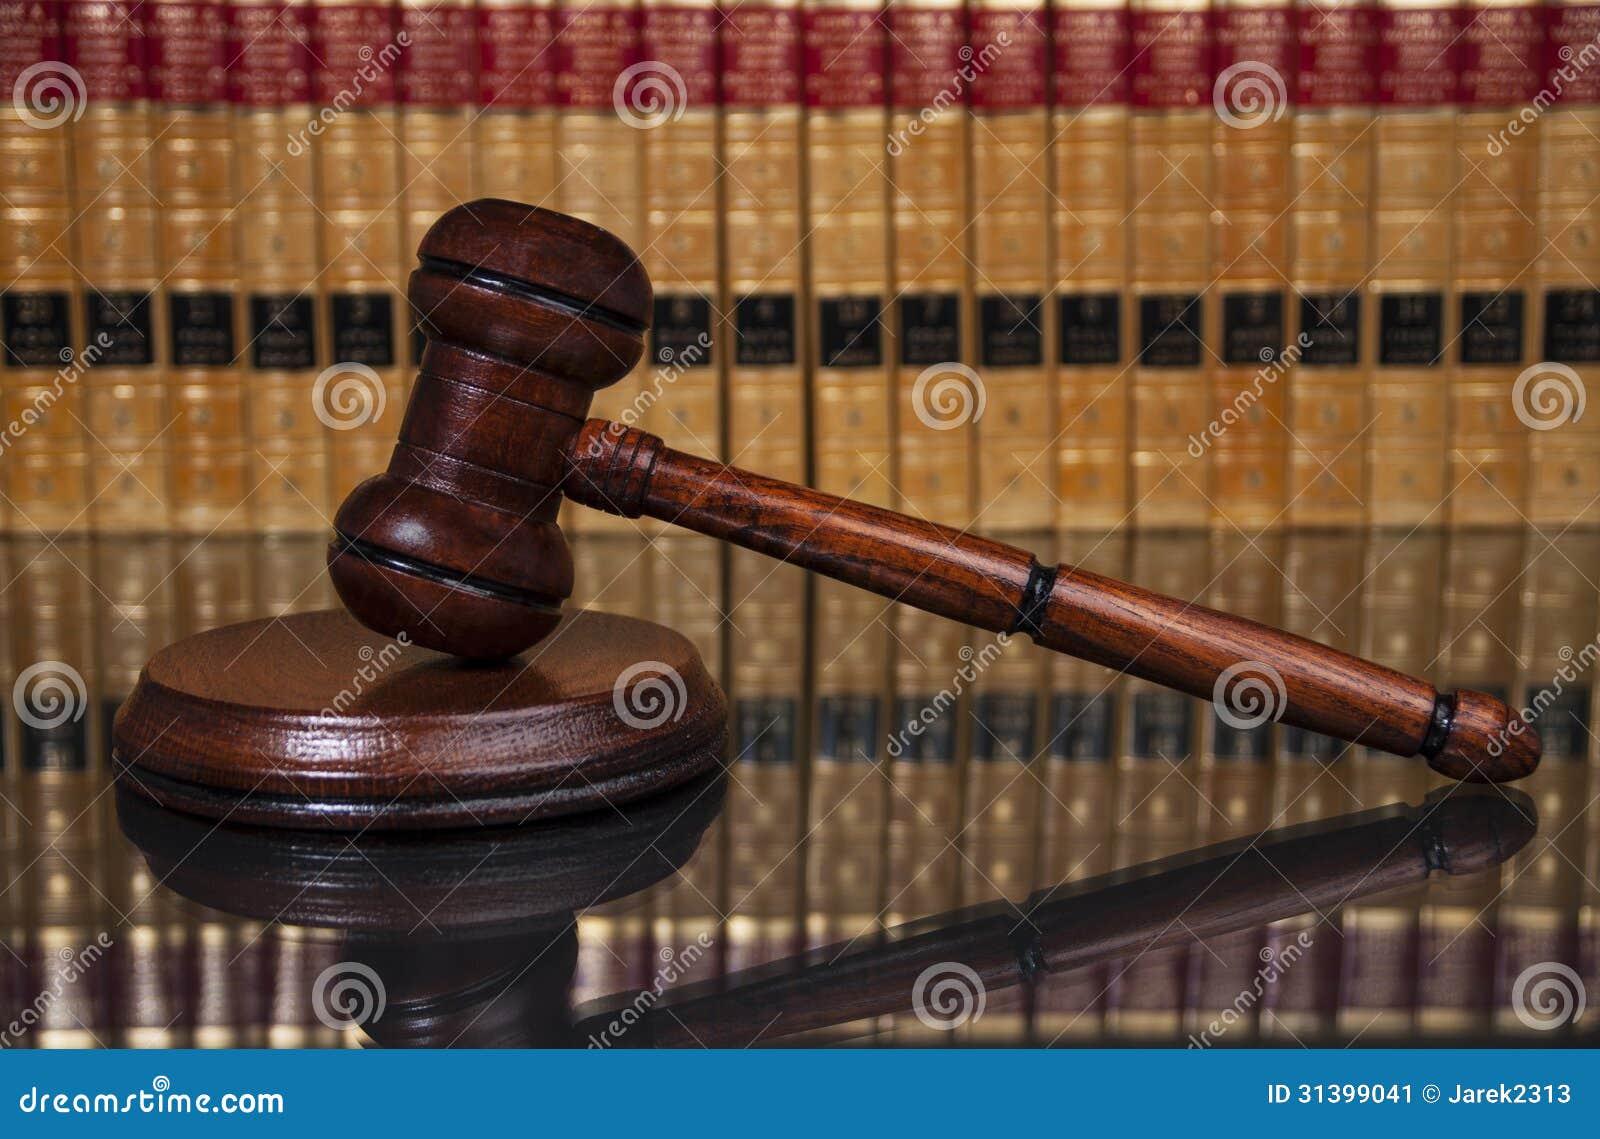 bureau d 39 avocat image stock image 31399041. Black Bedroom Furniture Sets. Home Design Ideas